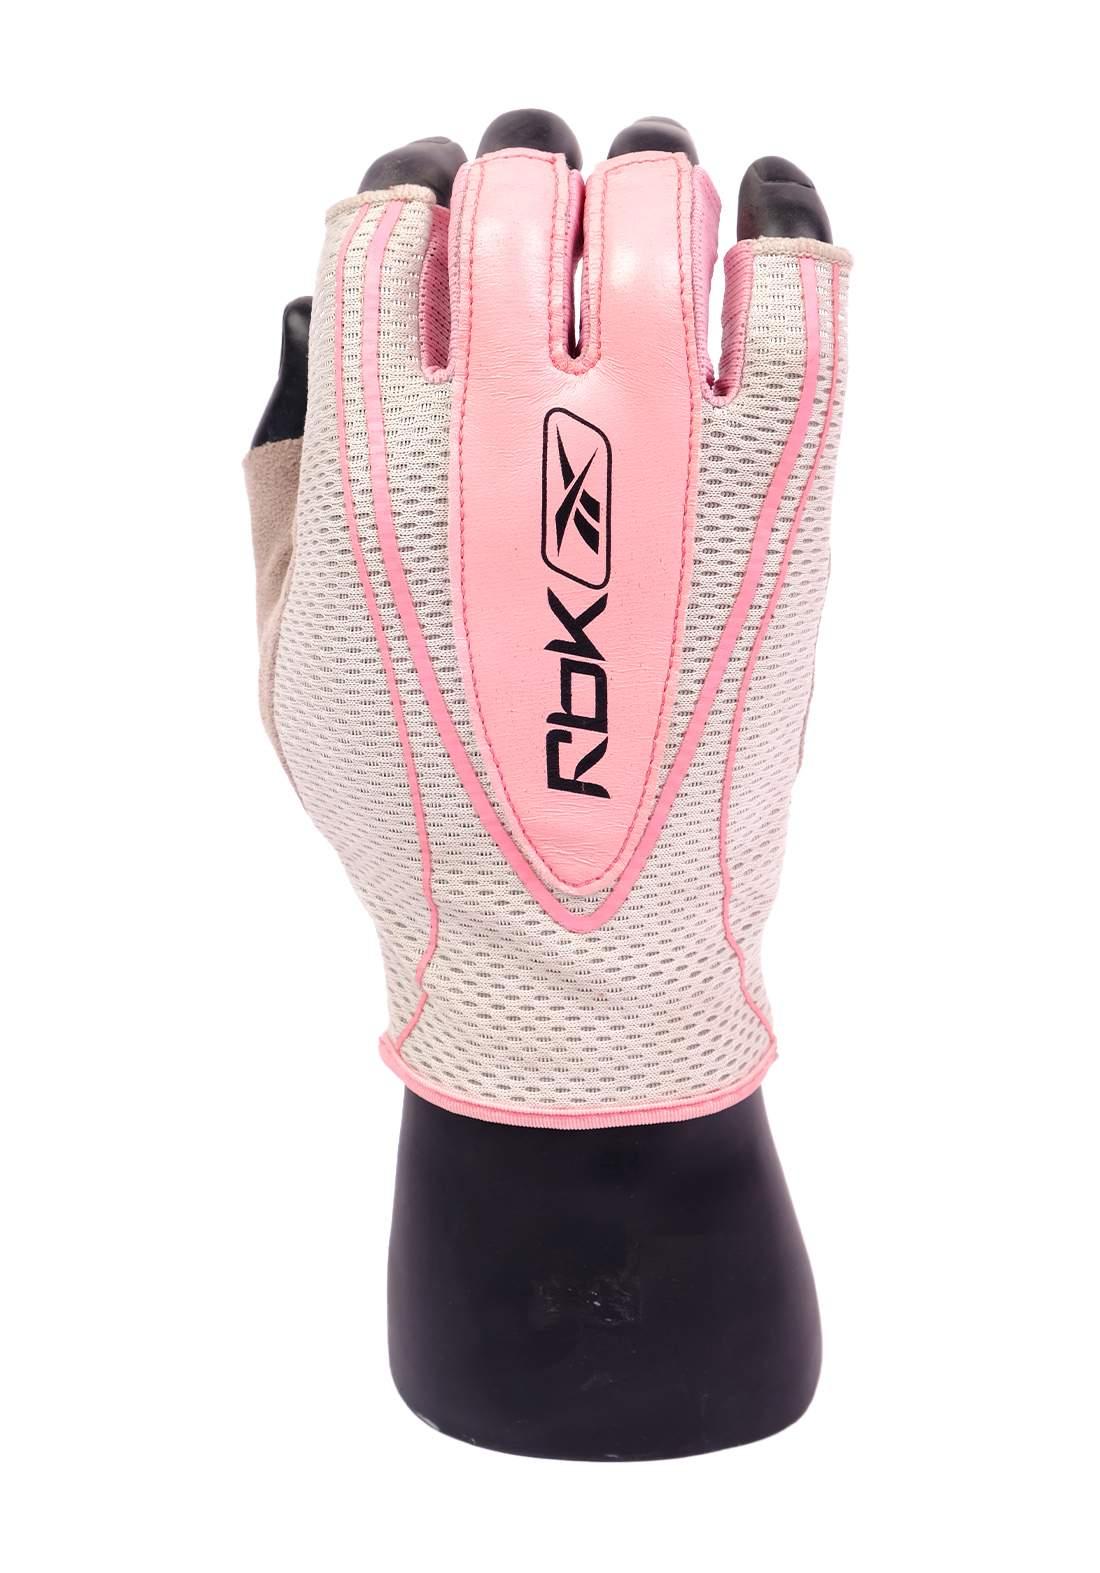 Reebok Lifting Glove  قفازات رياضية